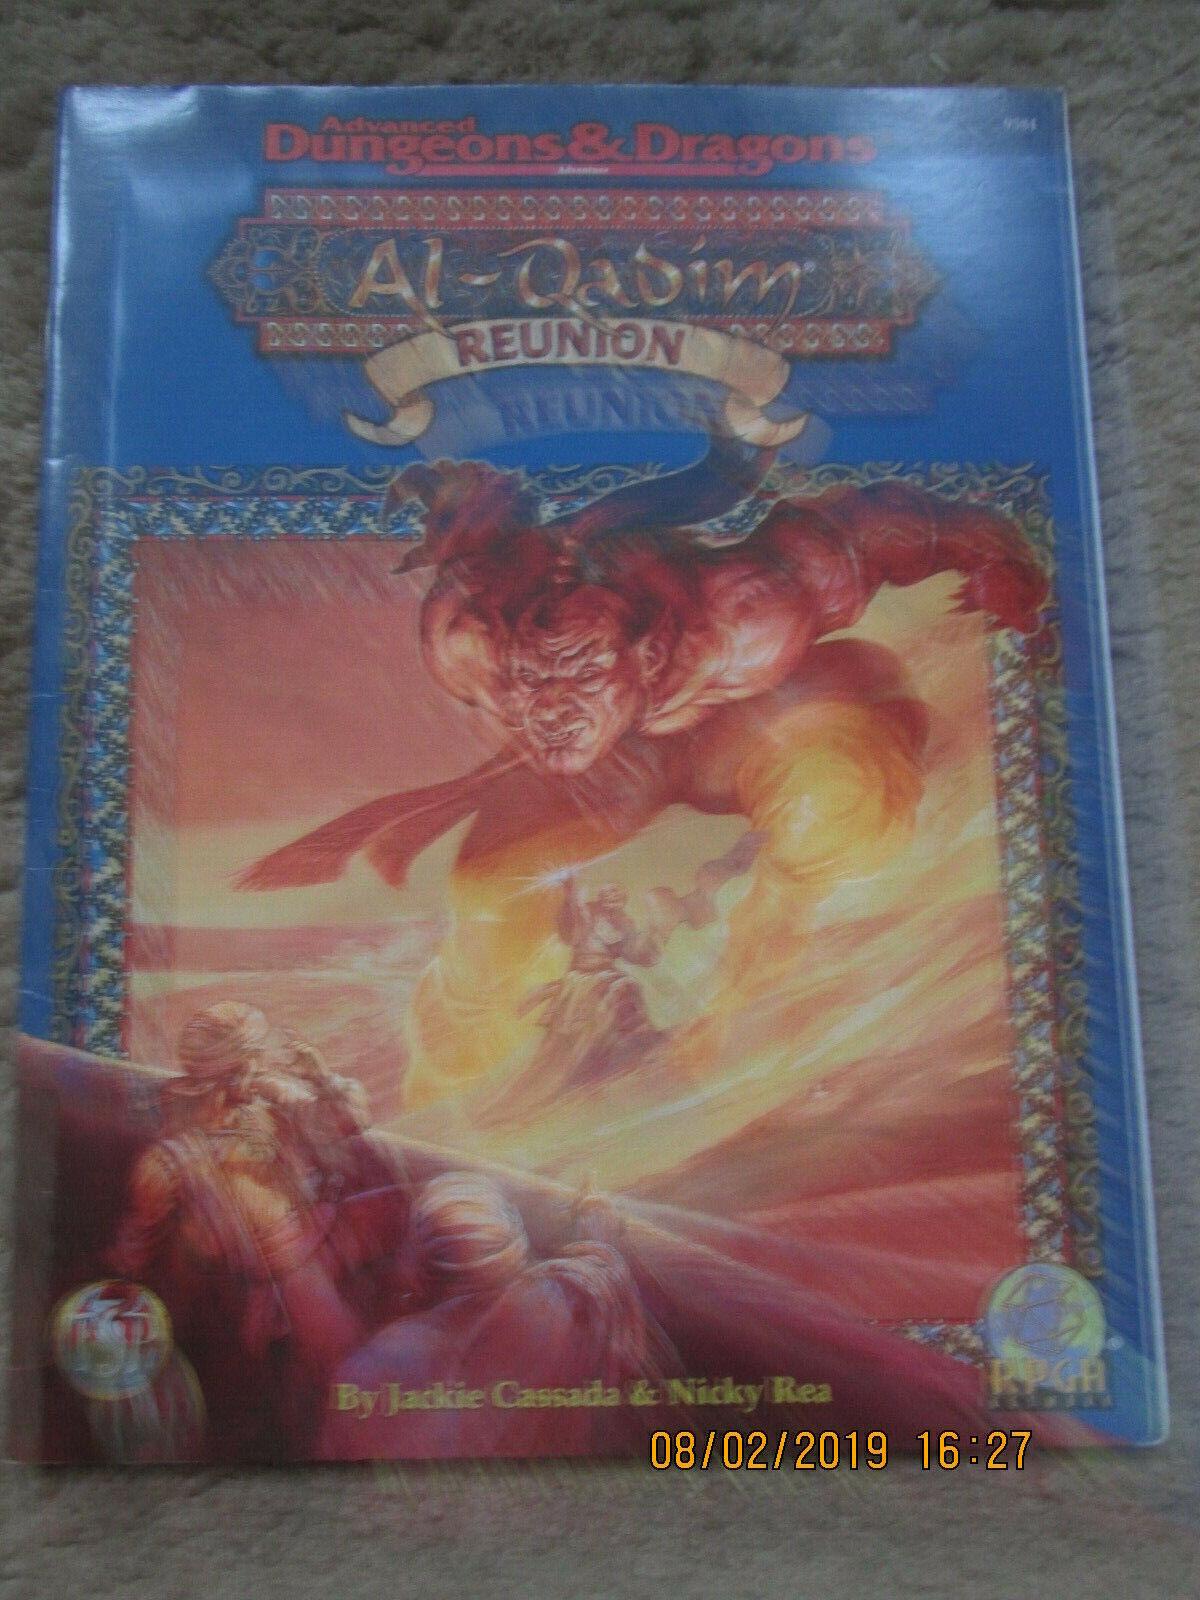 TSR AD&D 2E AL QADIM REUNION RPGA 9584 SW ADVANCED DUNGEON DRAGON